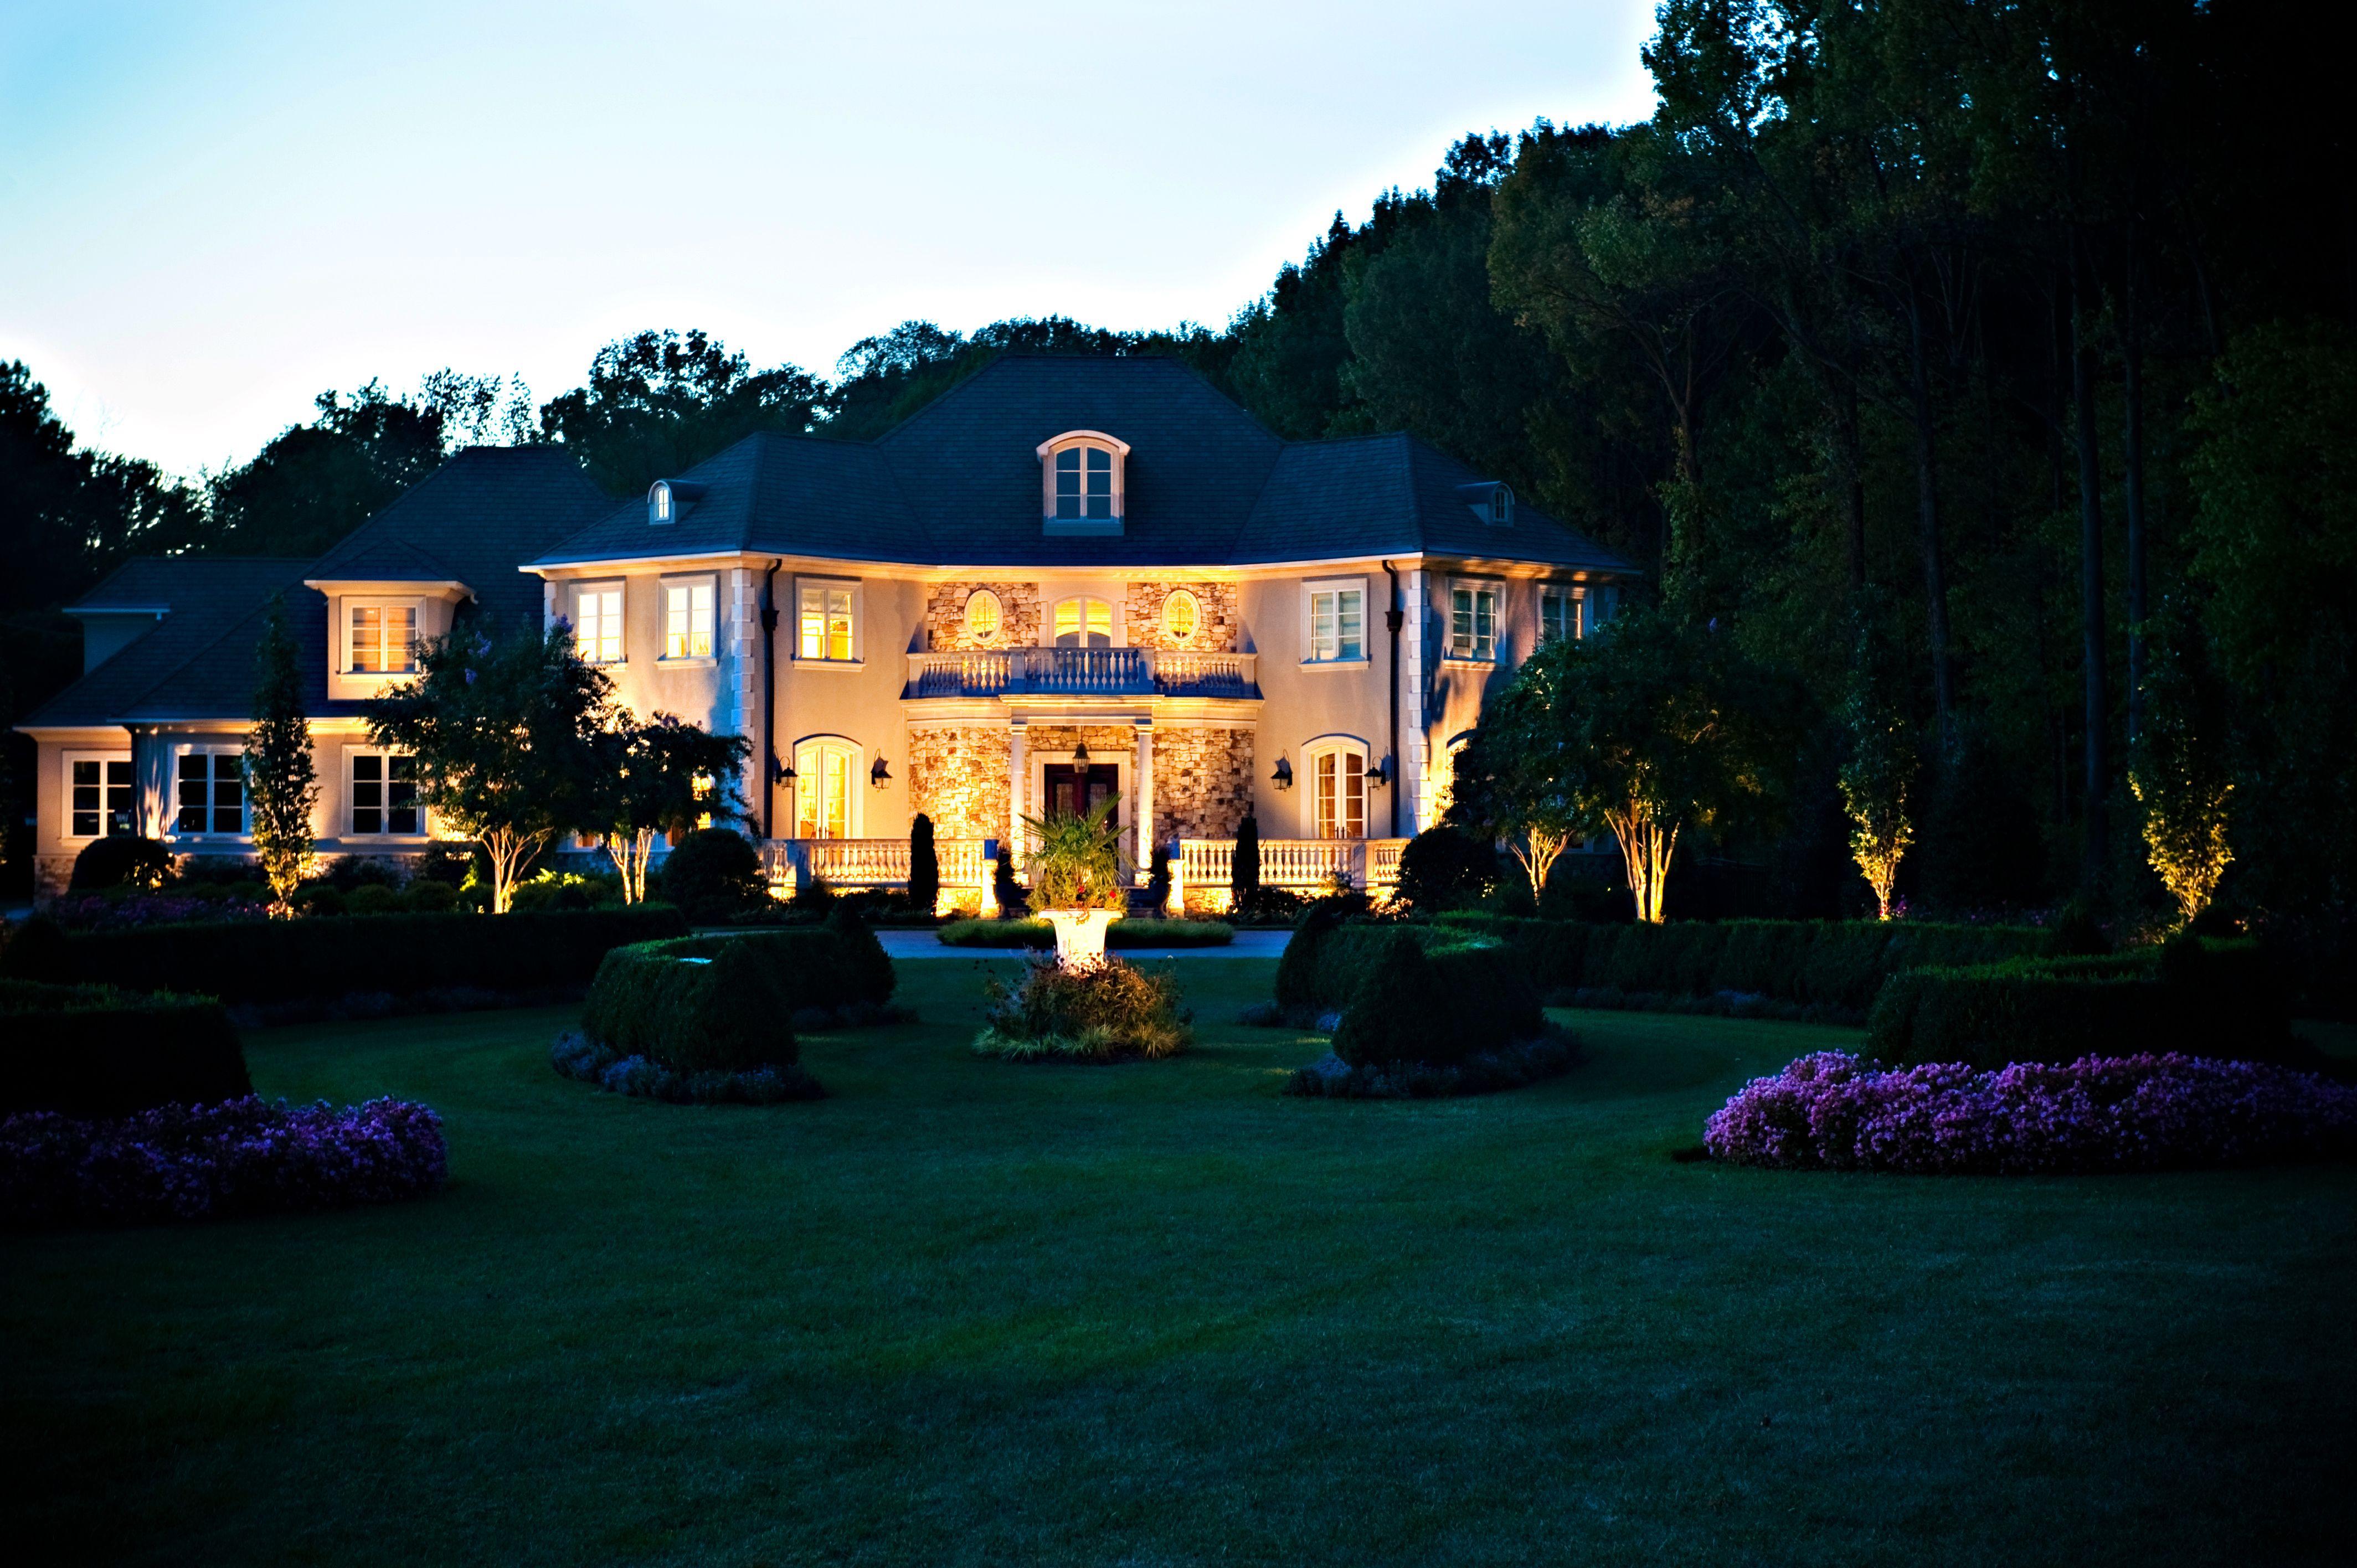 Stunning home in Moorestown NJ - Landscape Lighting done by Pinnacle Irrigation u0026 Nightlighting & Stunning home in Moorestown NJ - Landscape Lighting done by ... azcodes.com